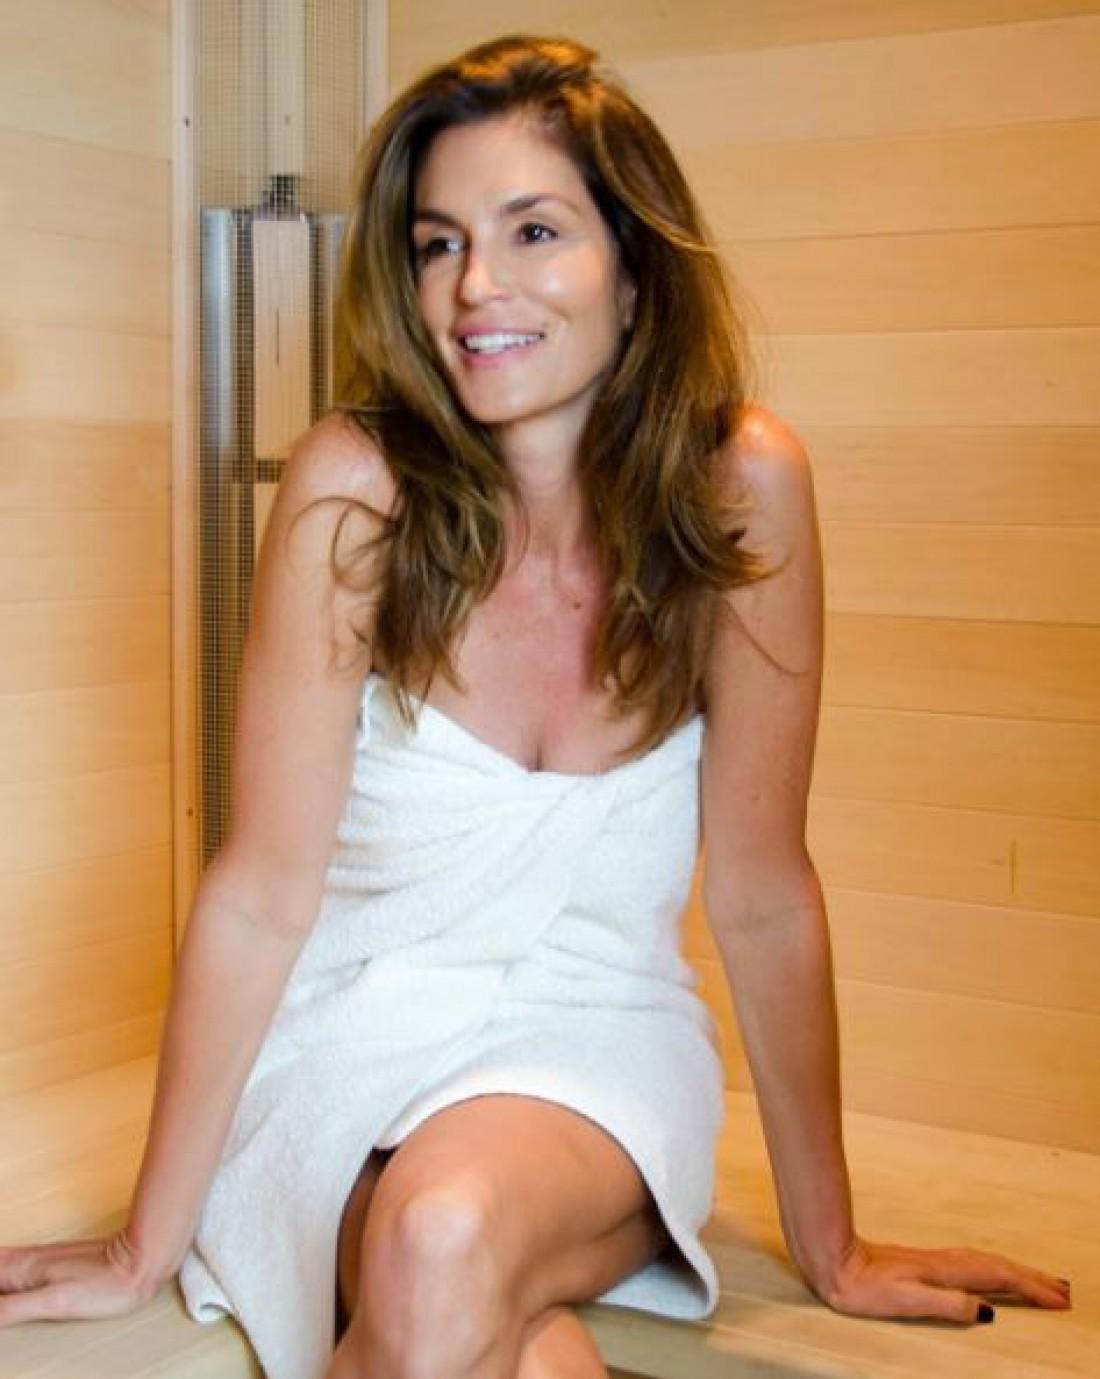 Синди Кроуфорд в банном полотенце